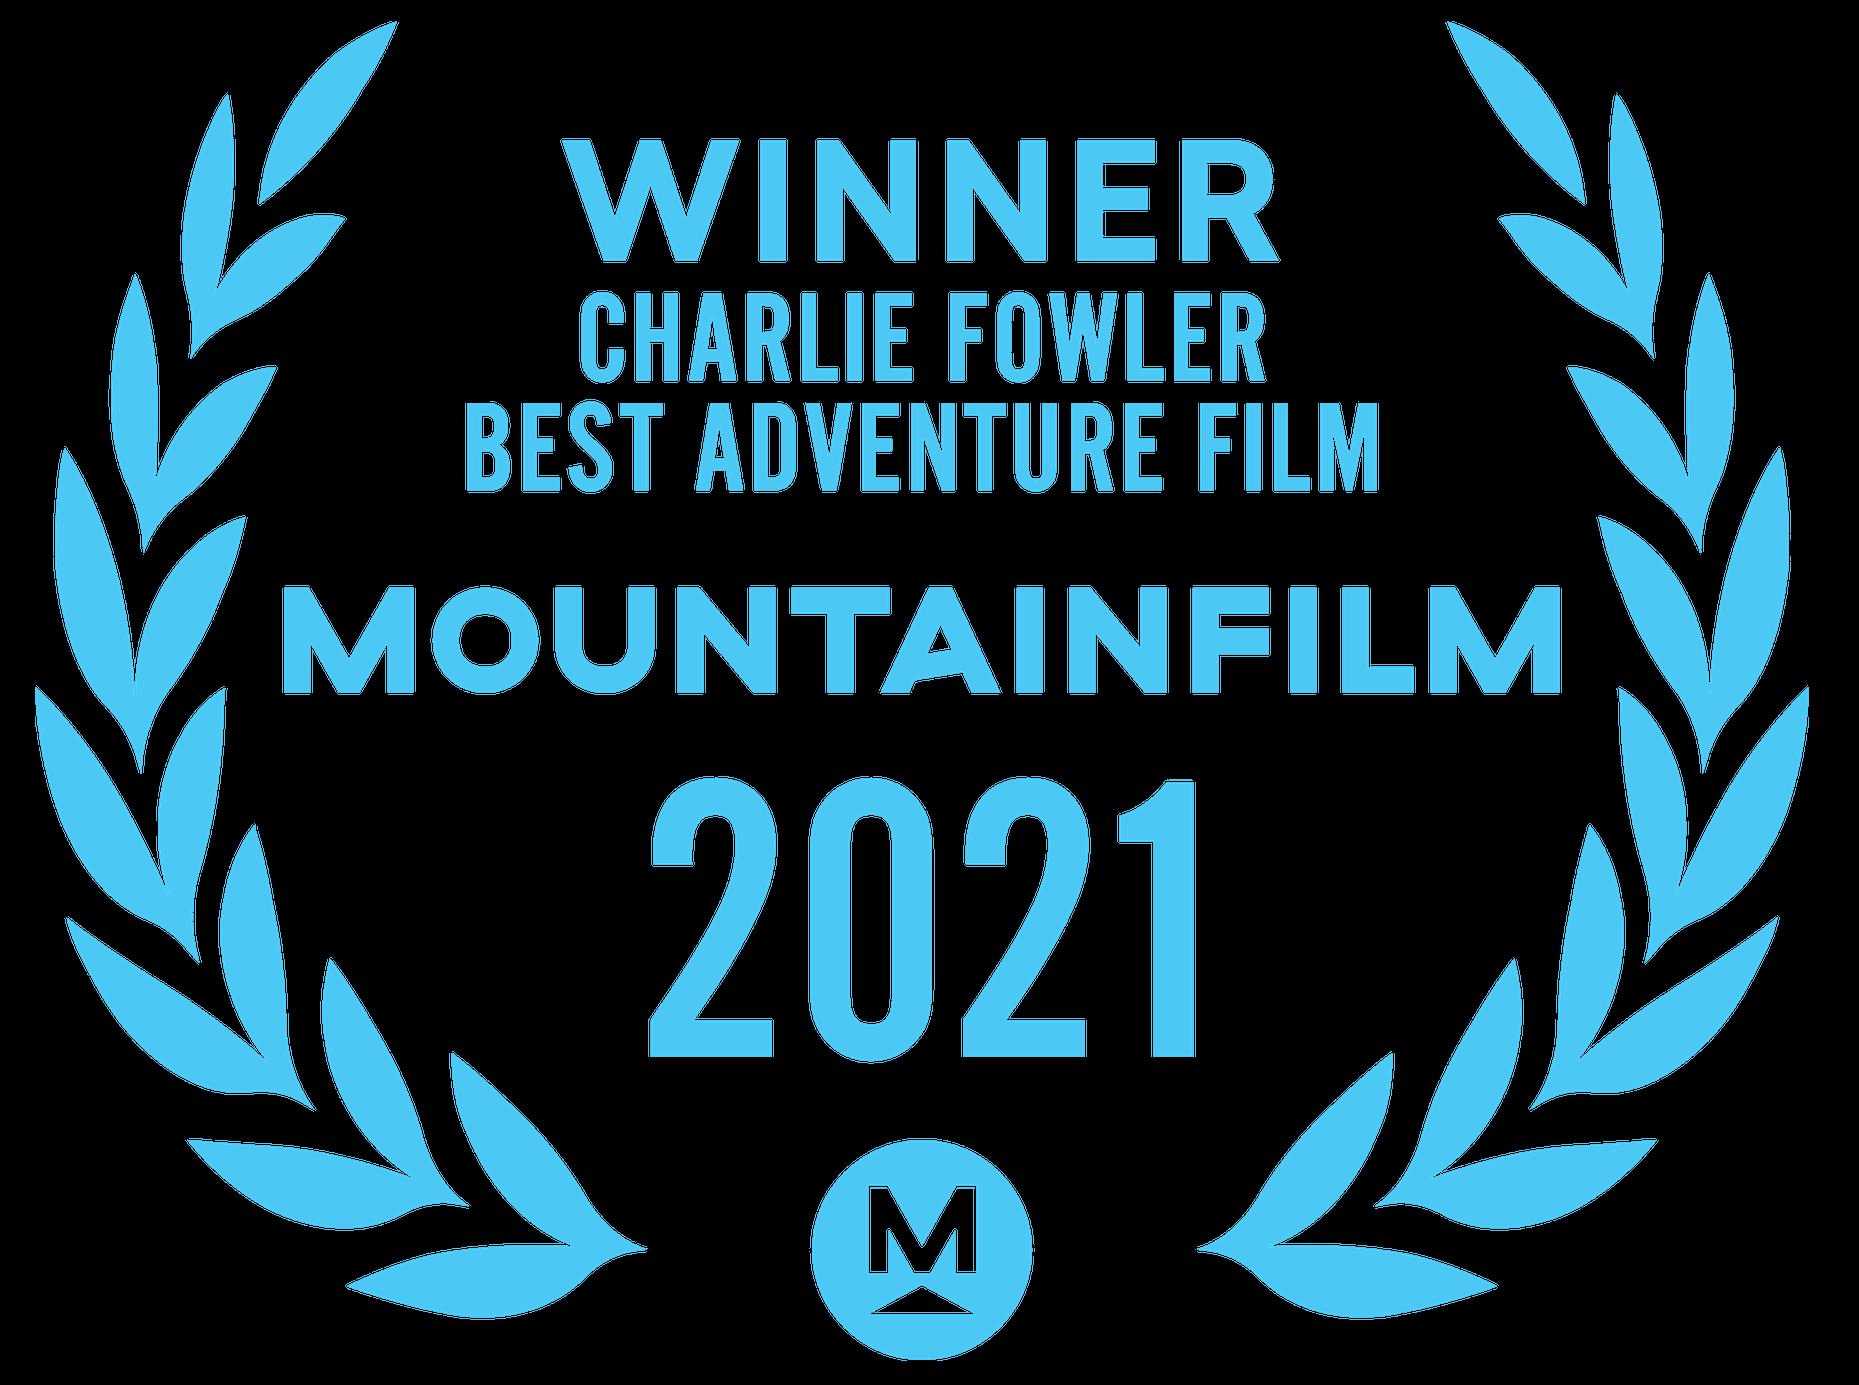 WINNER Charlie Fowler Best Adventure Film Mountain Film 2021